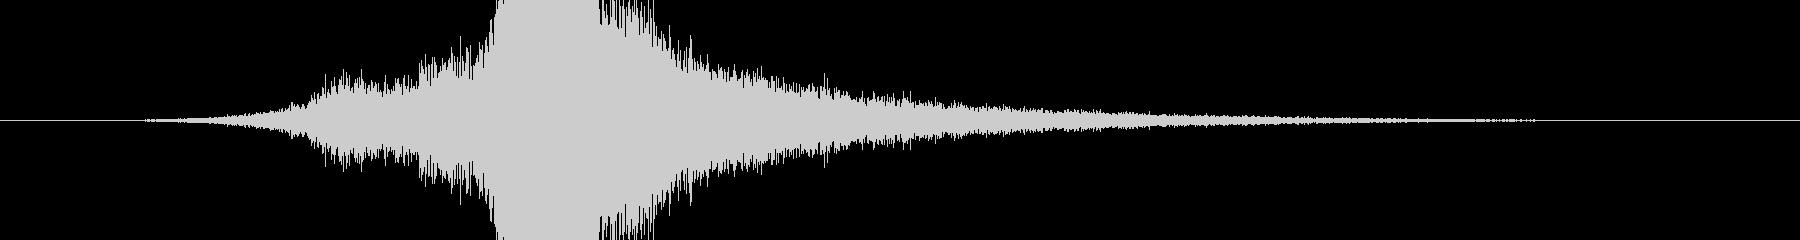 RPG系魔法イメージ音08 光の未再生の波形